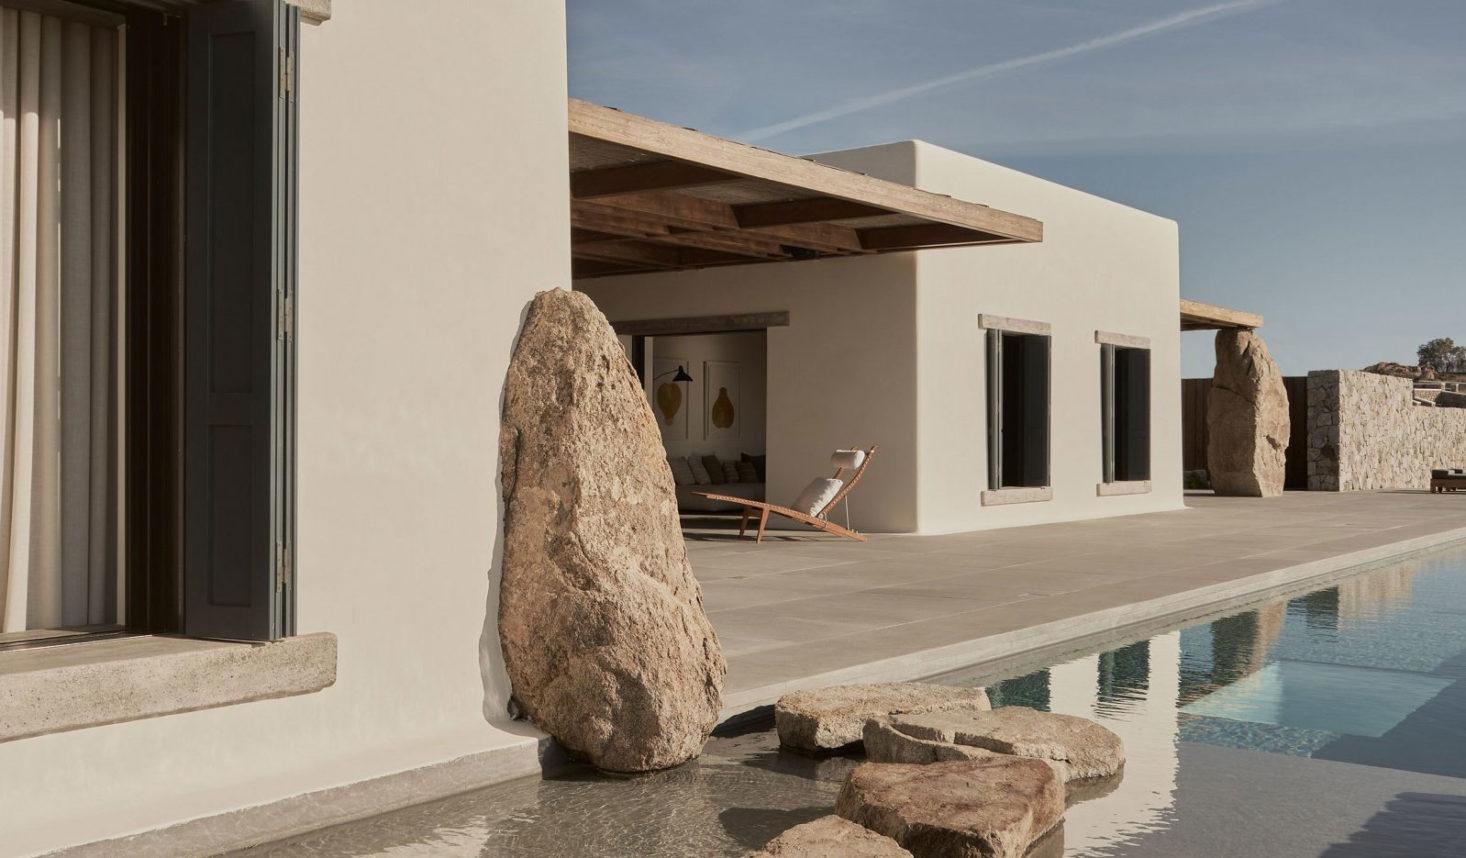 Places of Tranquility: Villa Mandra | Evano Magazine